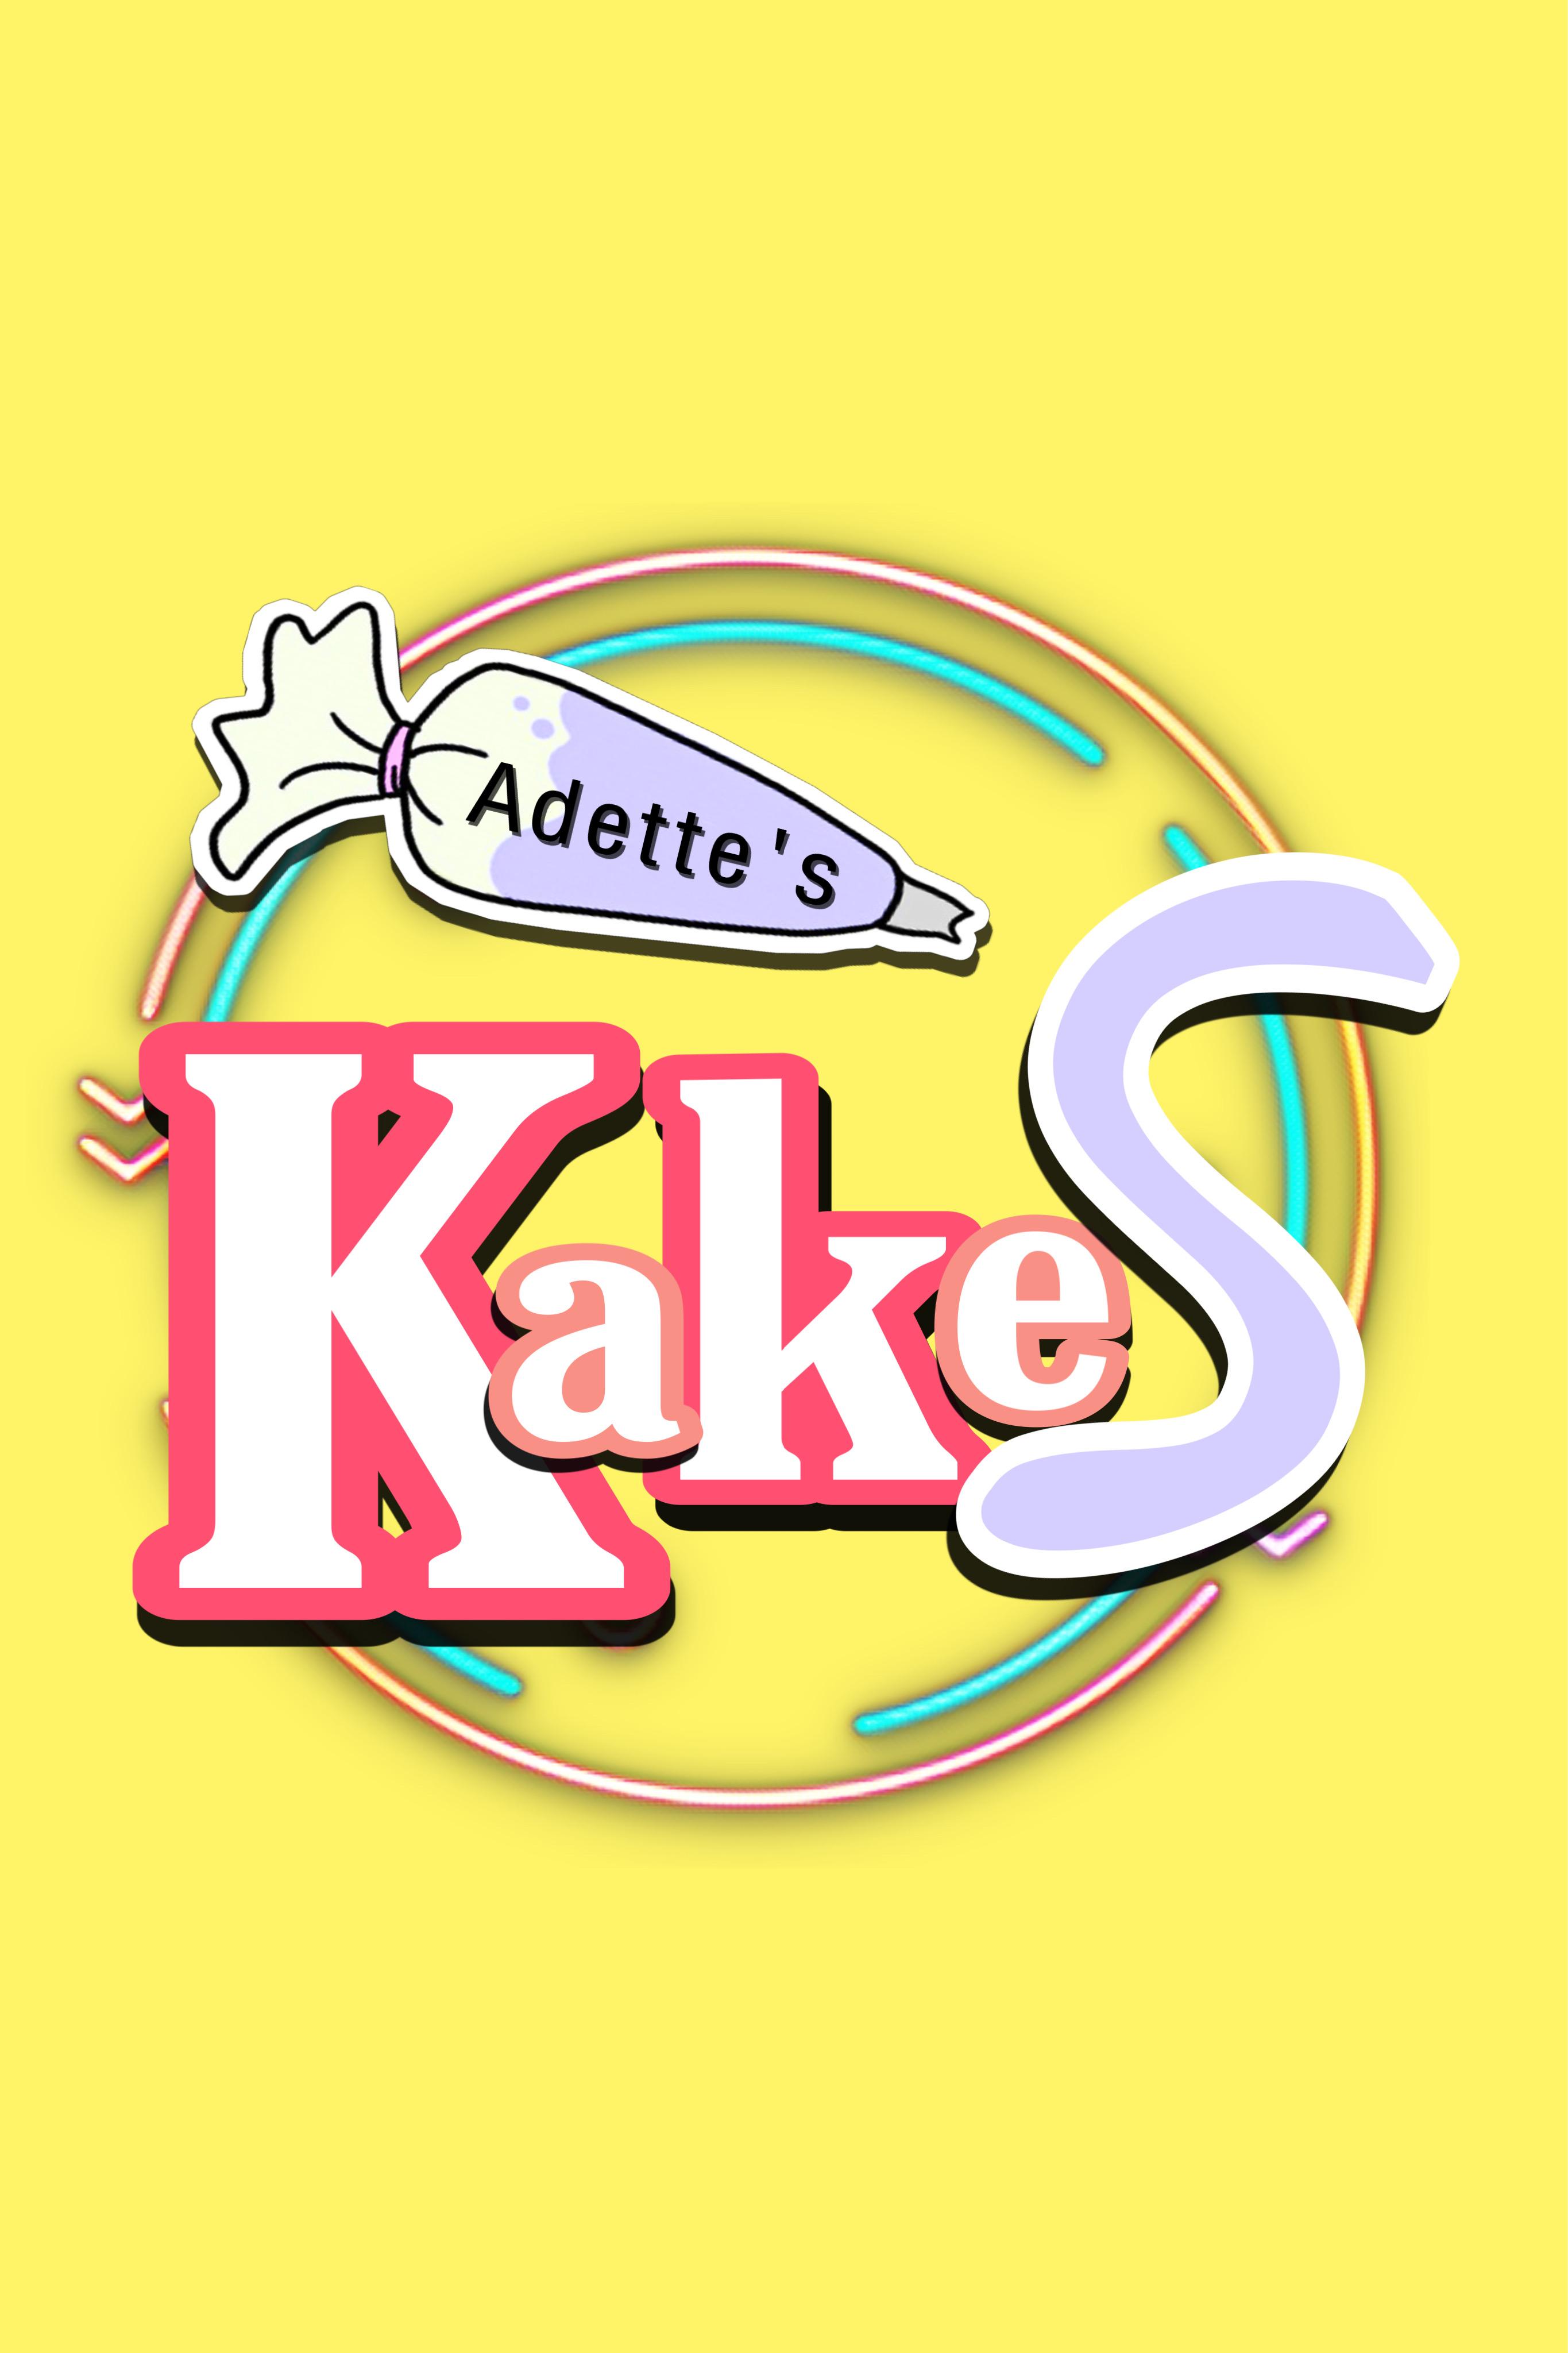 Kakes by Adette